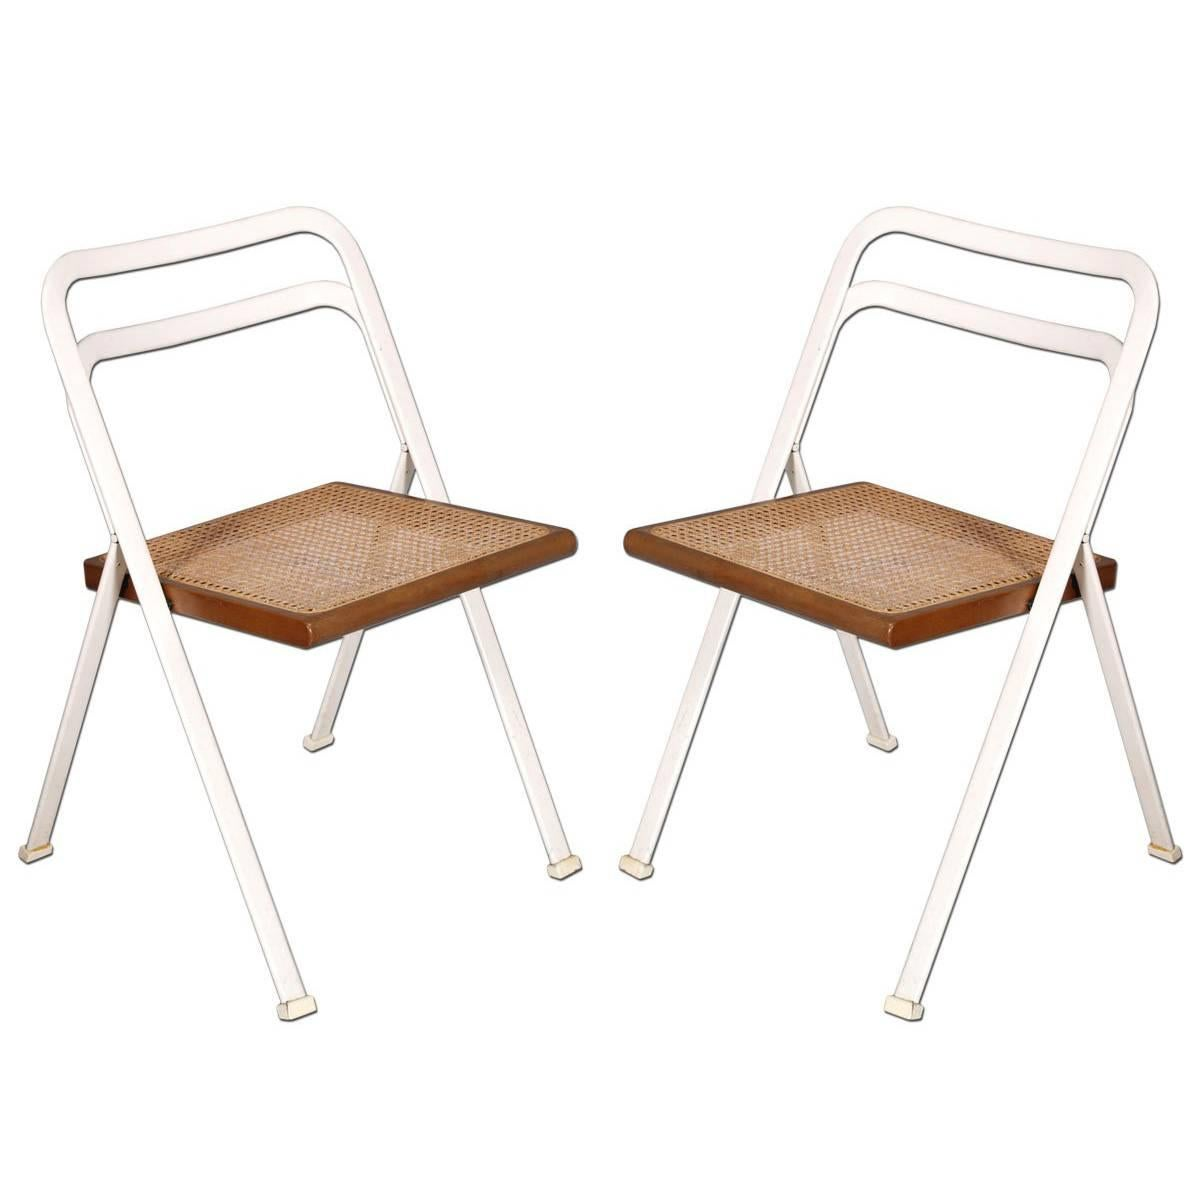 Sedie Pieghevoli Calligaris Design.Italy Calligaris Renaissance Pisane Chairs Solid Turned Oak